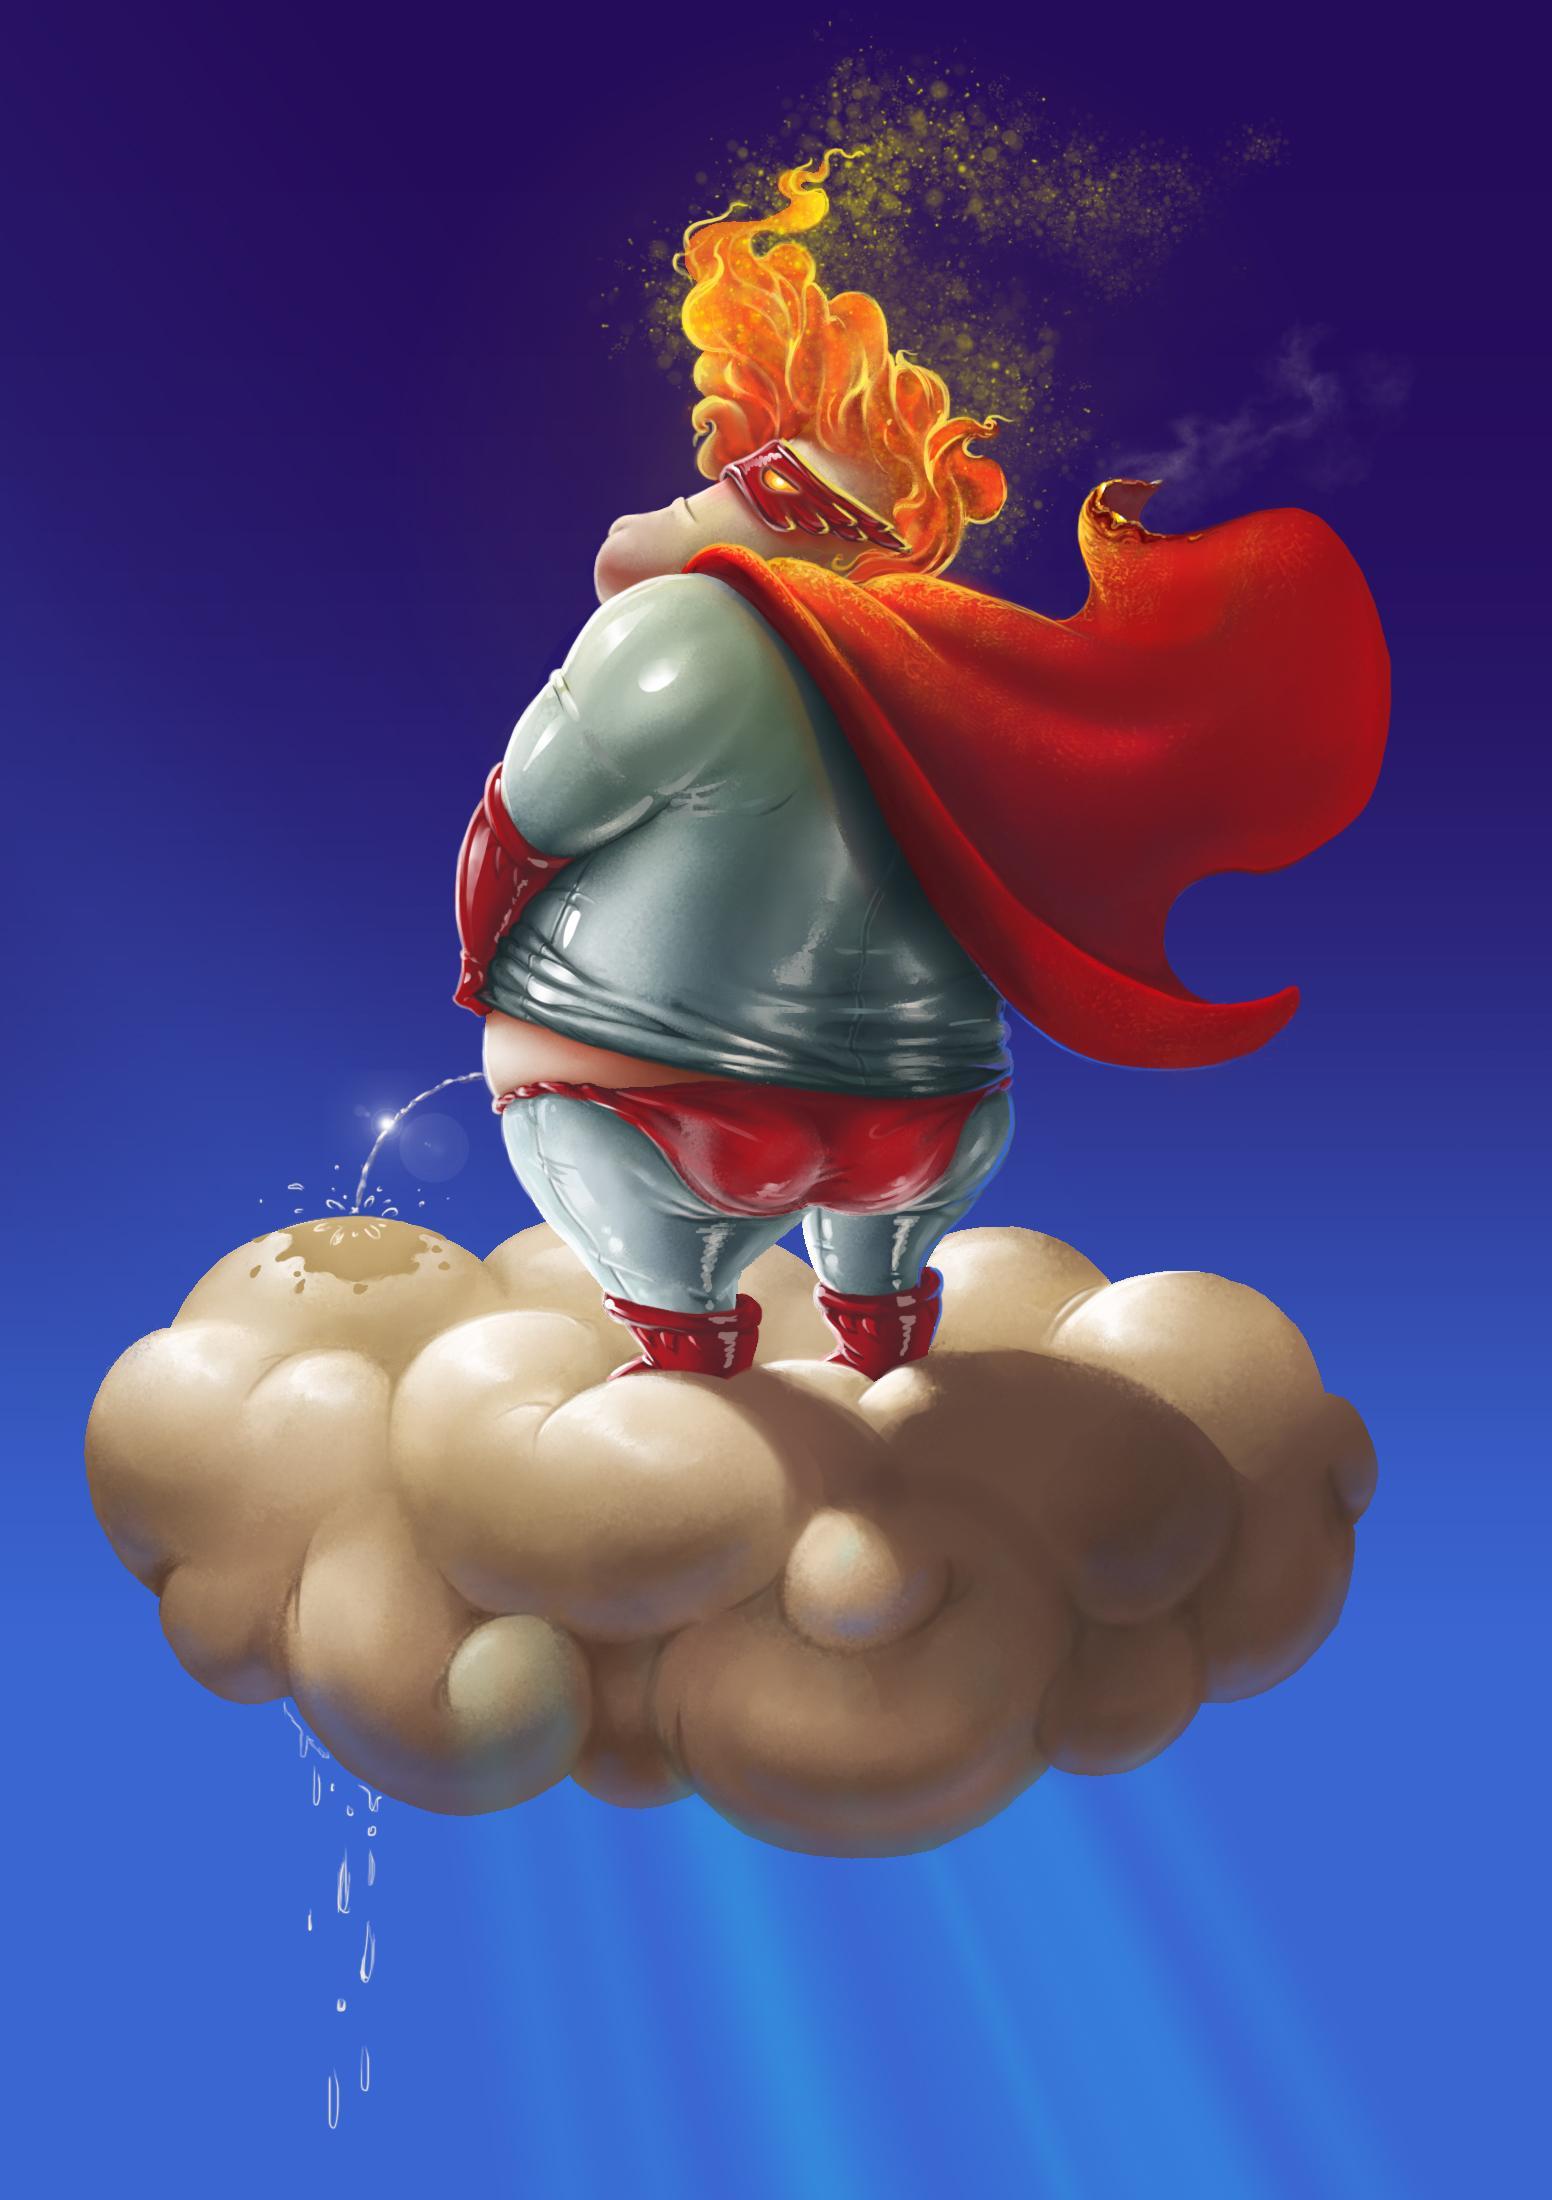 Evil Super hero - image 9 - student project